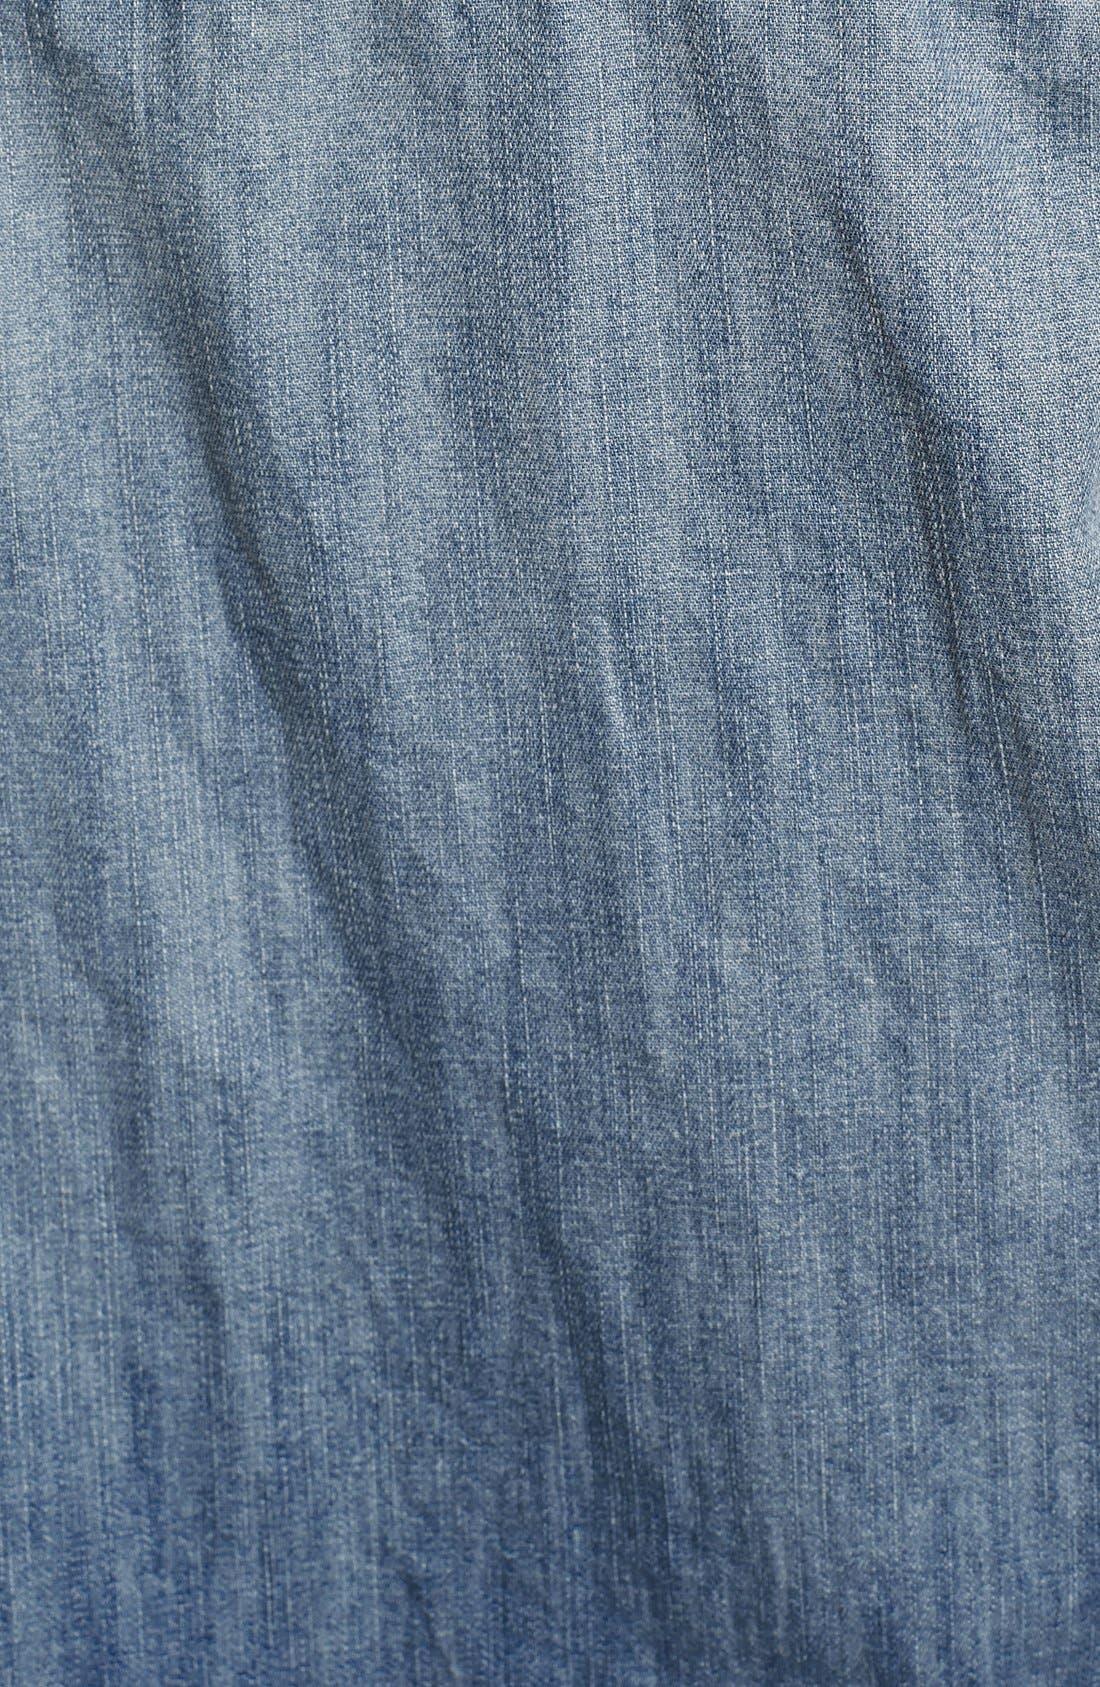 Alternate Image 3  - Current/Elliott 'The Perfect Shirt' Denim Shirt